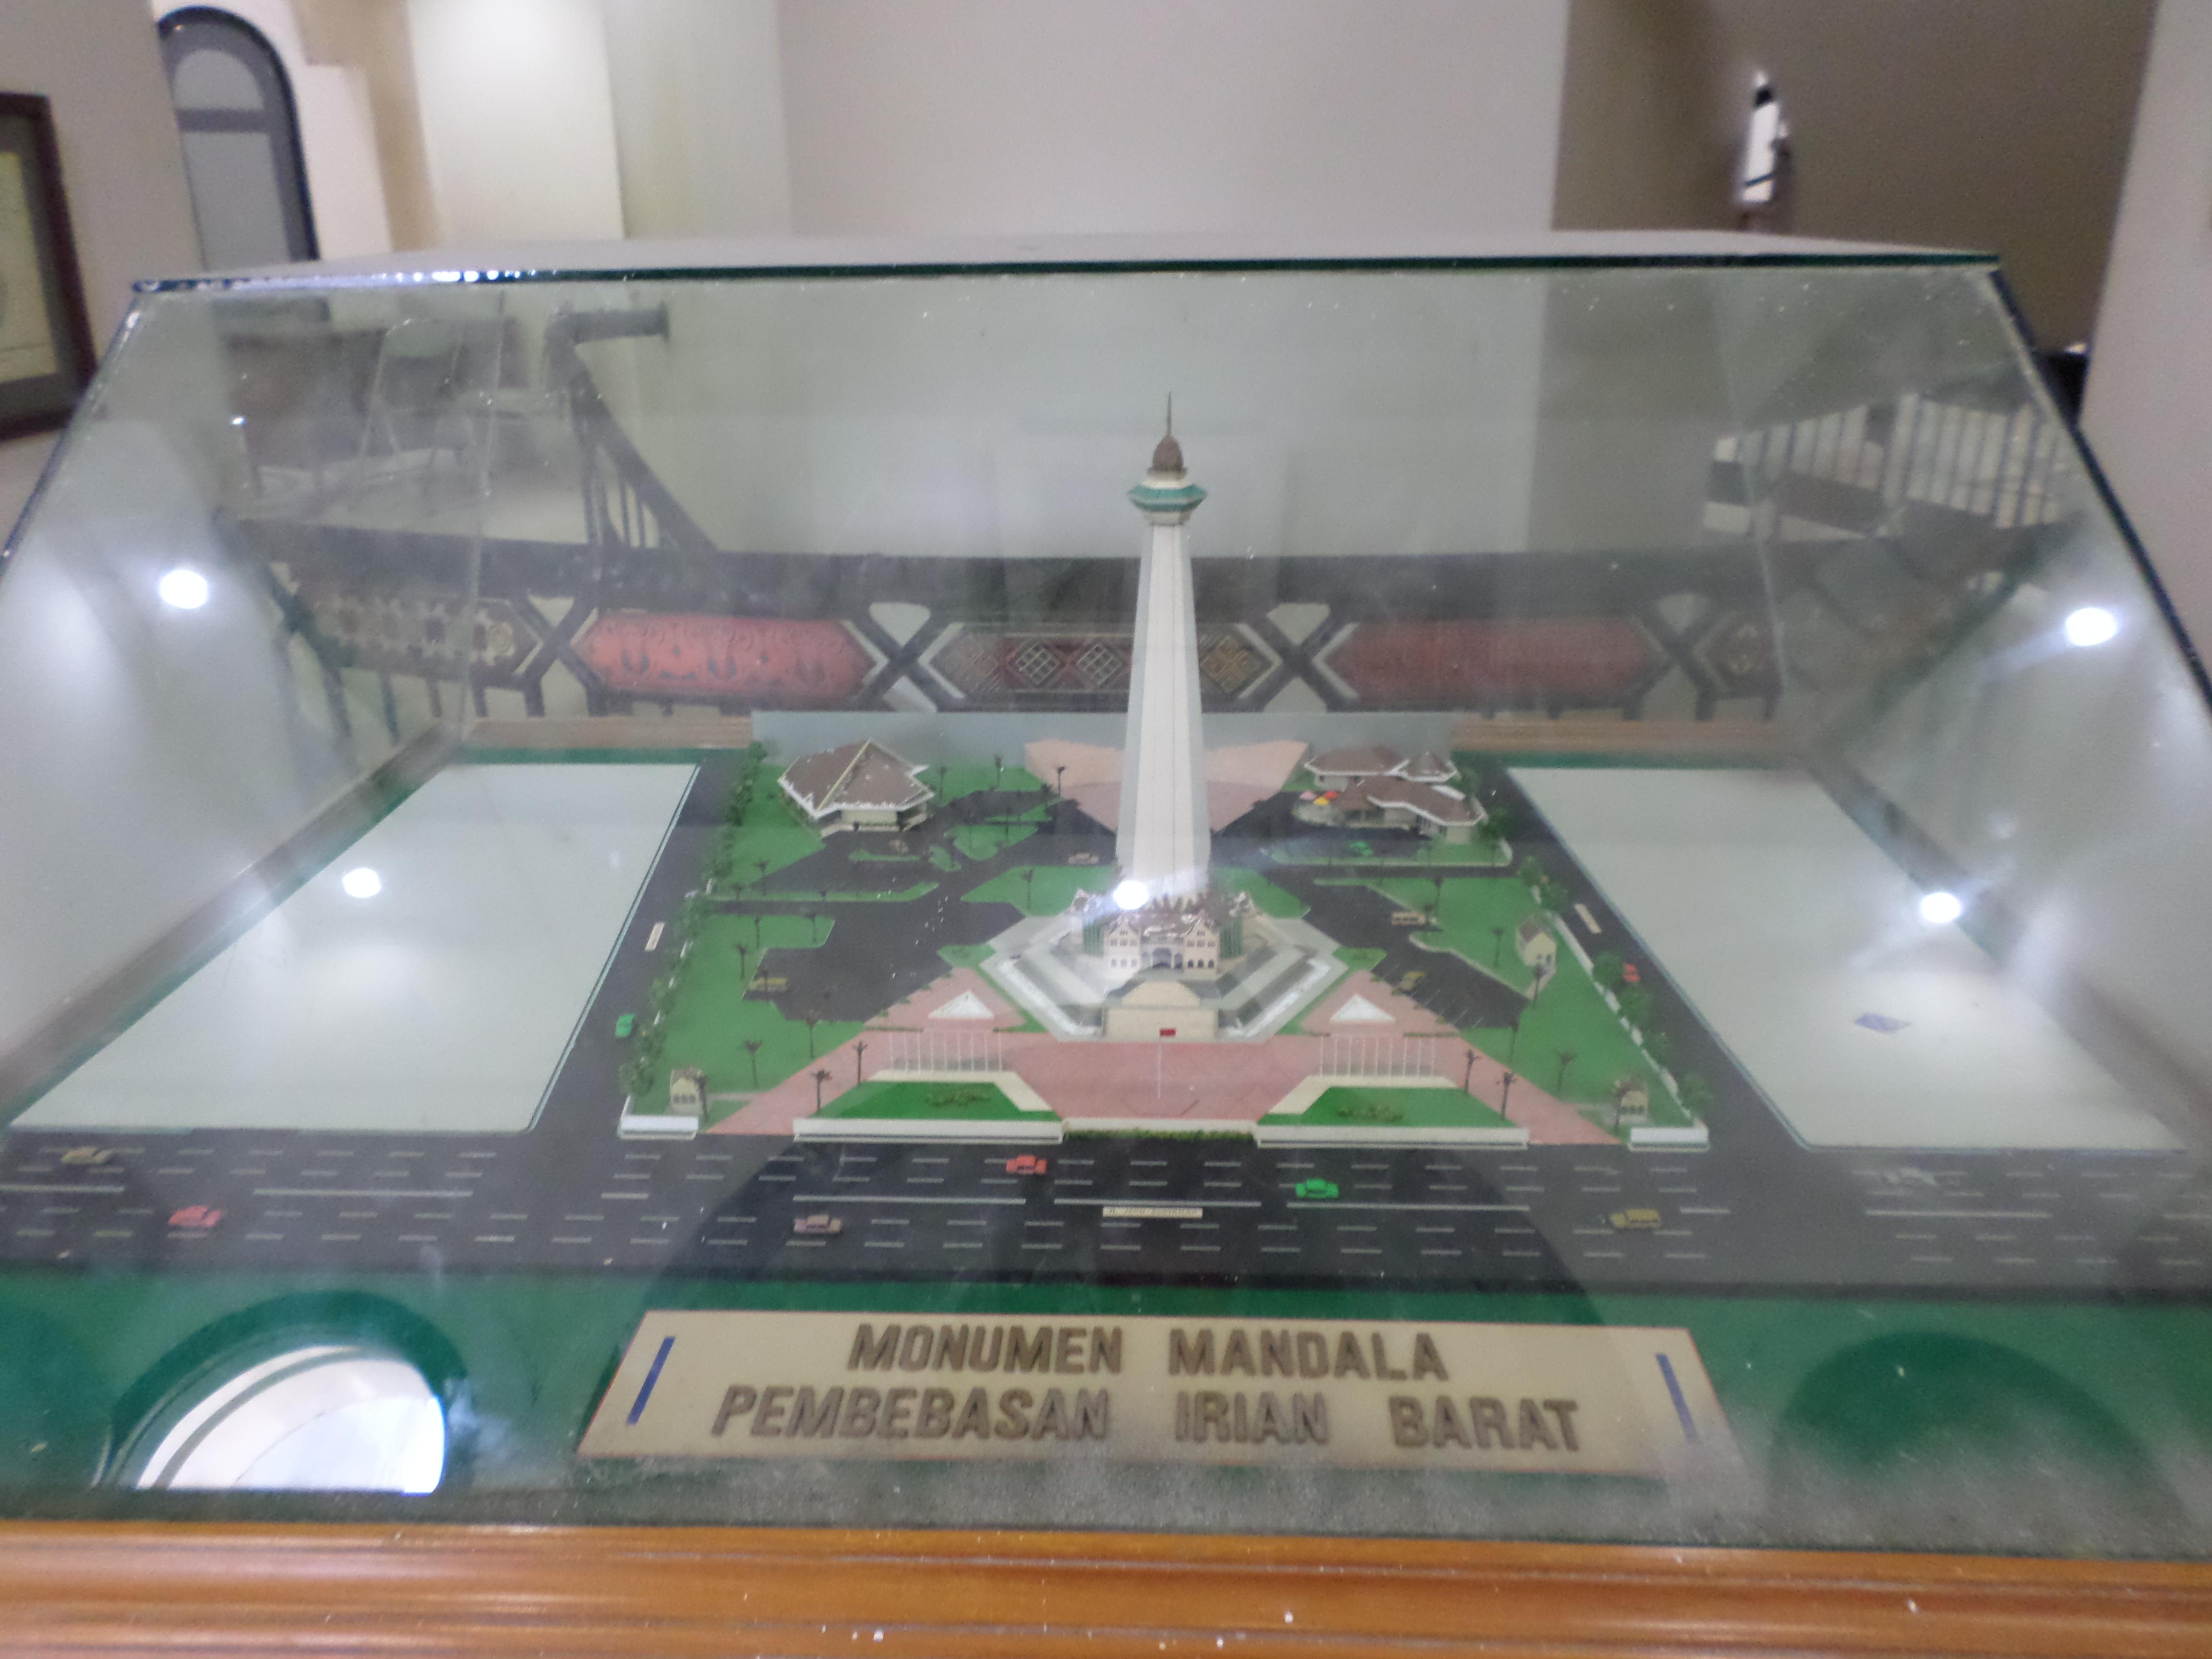 Monumen Mandala Monas Makassar Akbar Mangindara Maket Kawasan Pembebasan Irian